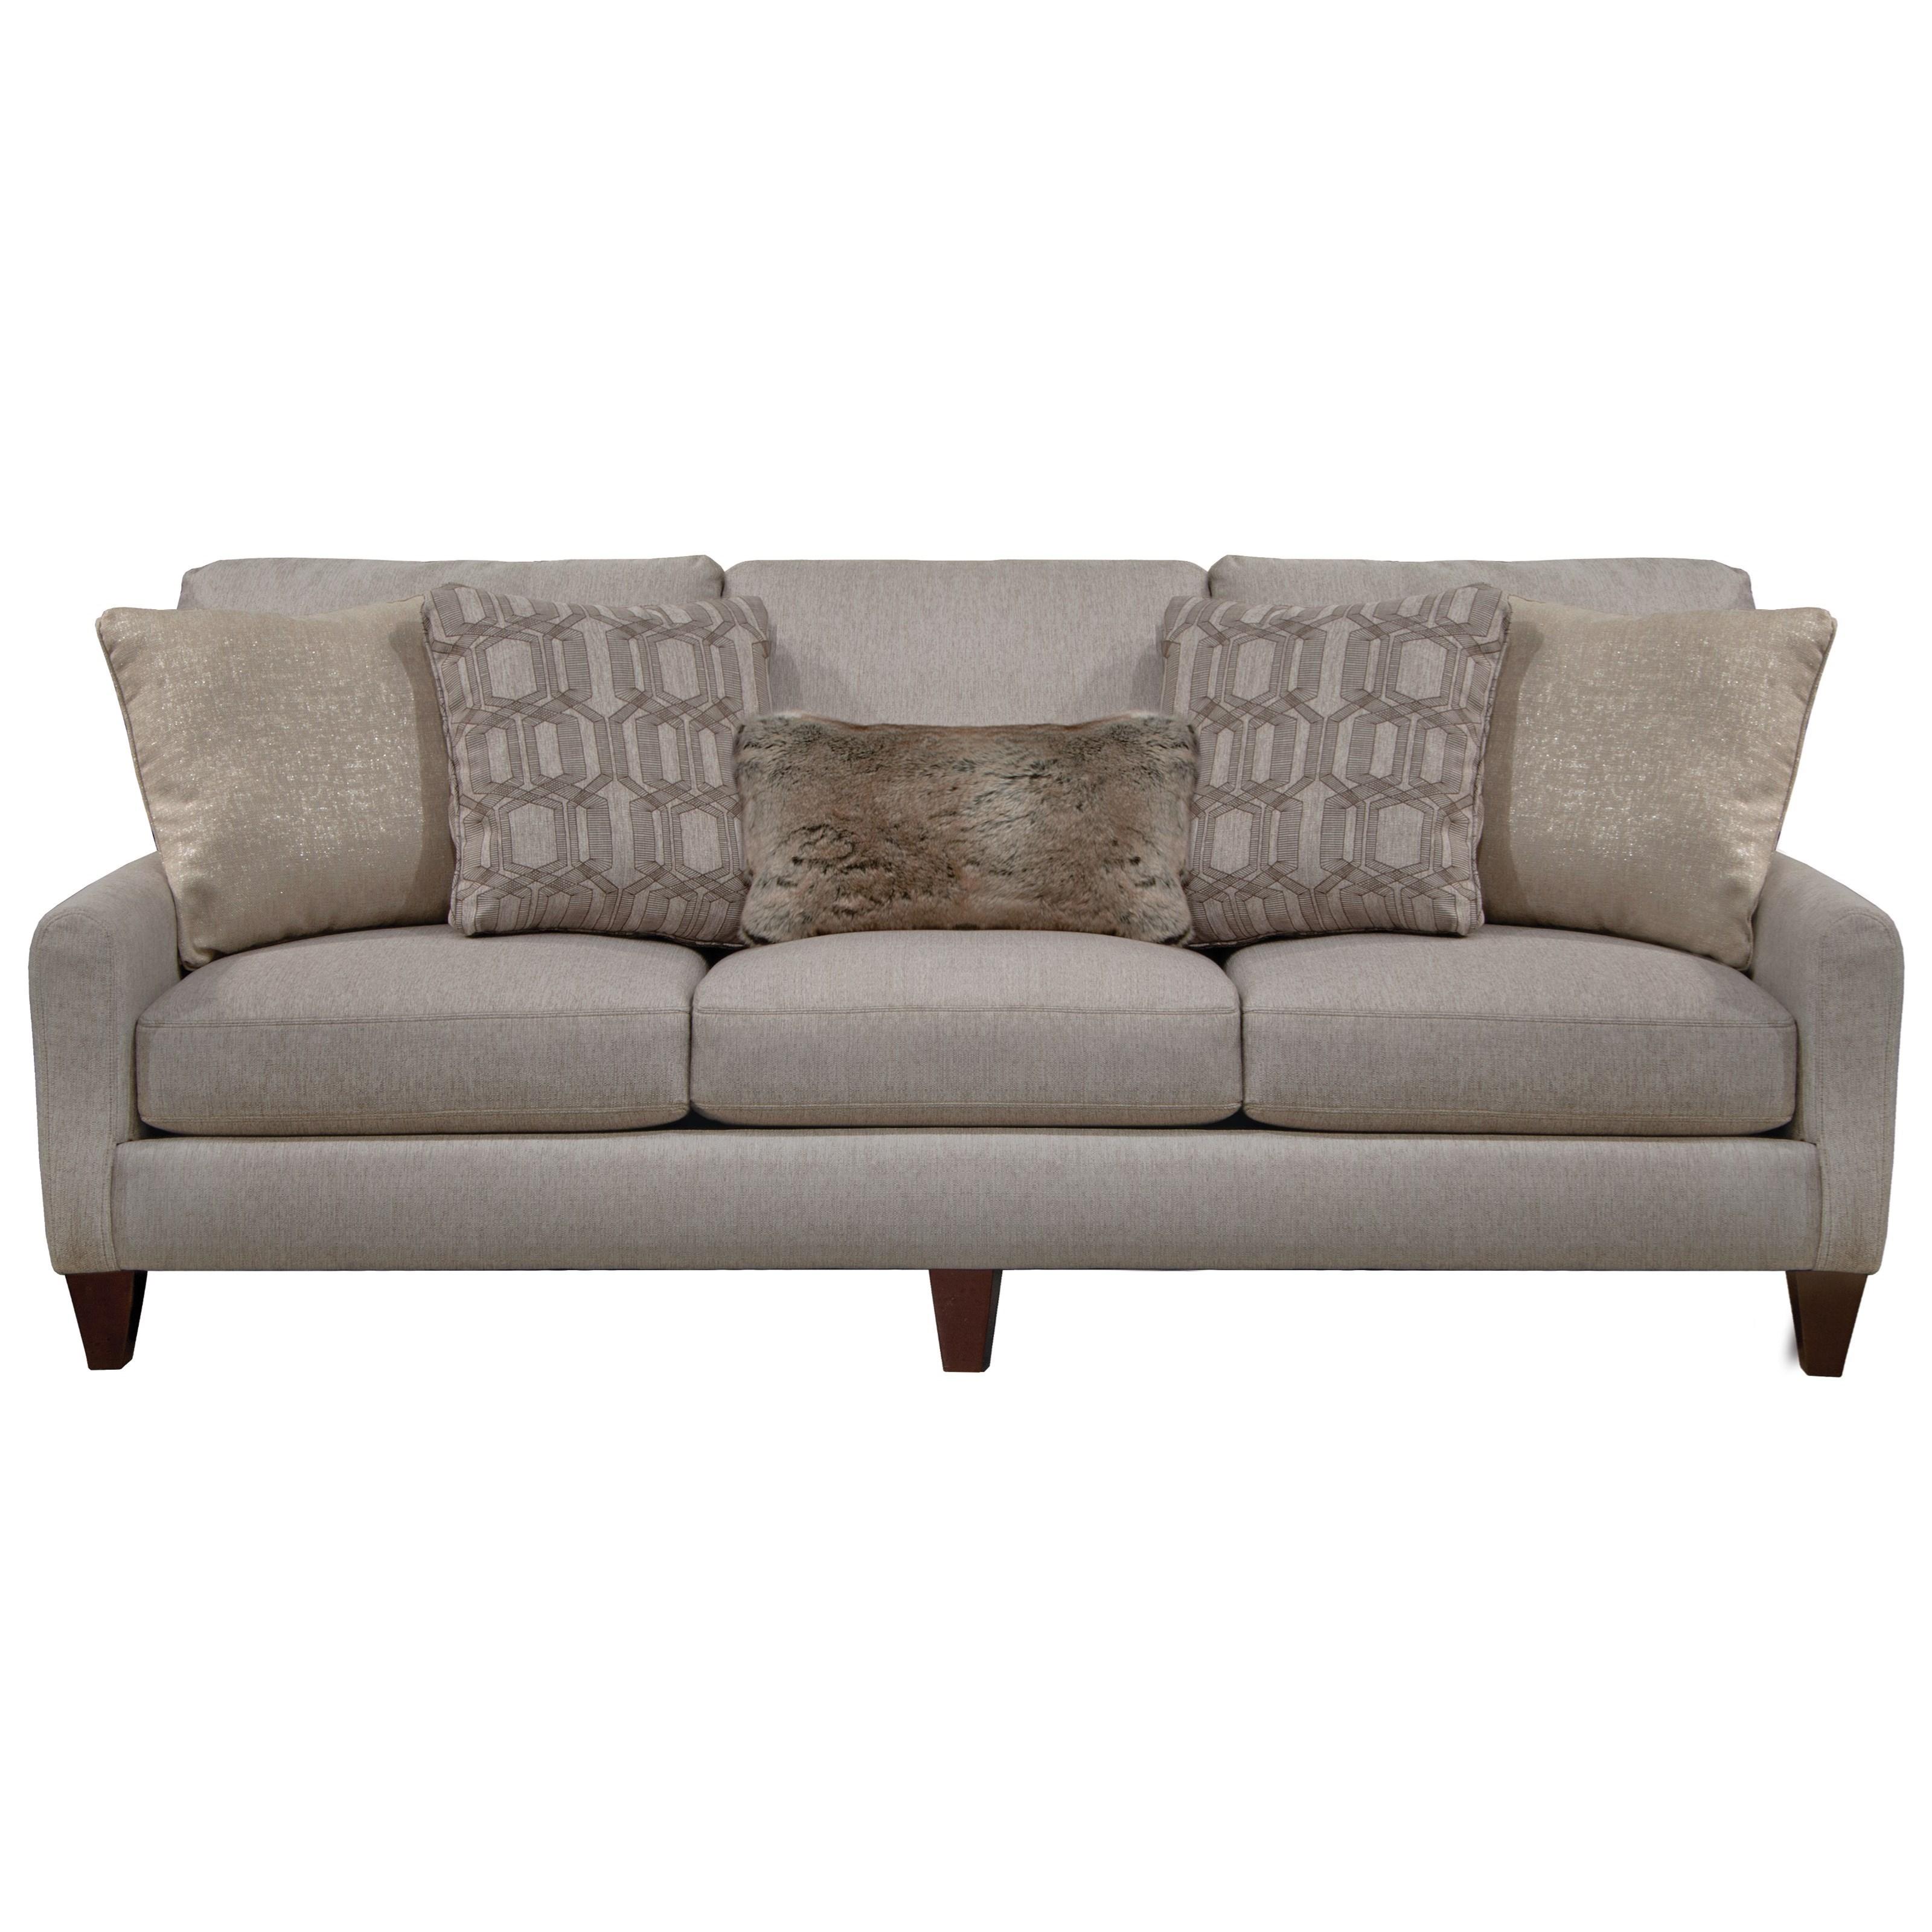 Jackson Furniture Ackland Sofa with USB Port - Item Number: 3156-13-1642-19